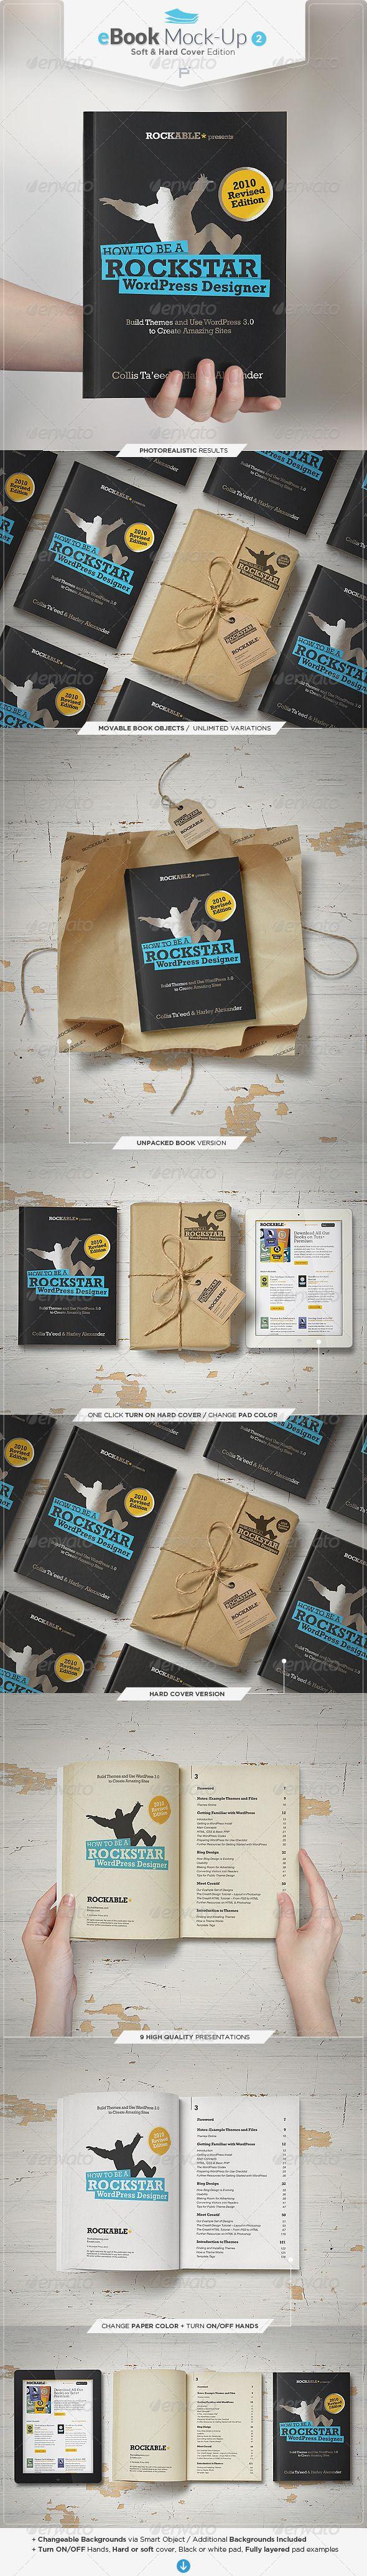 pin by best graphic design on mockup mockup mockup